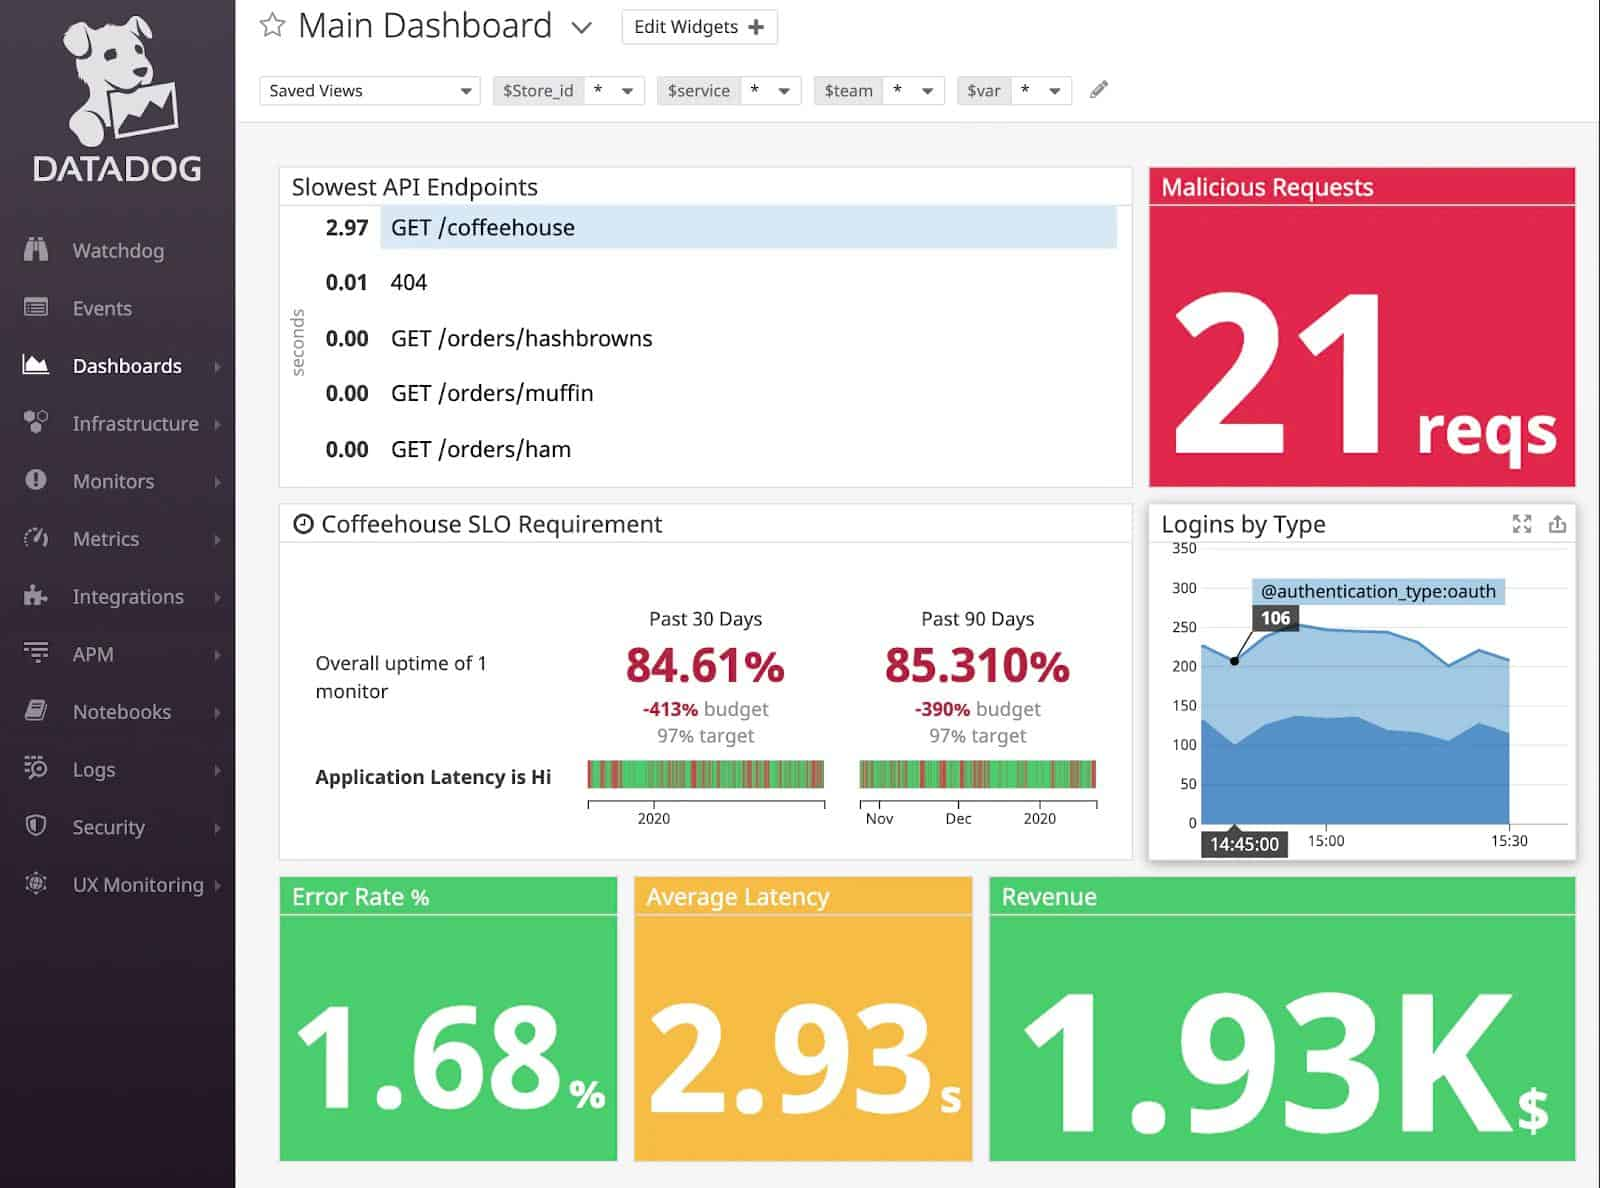 Datadog API Endpoint Security